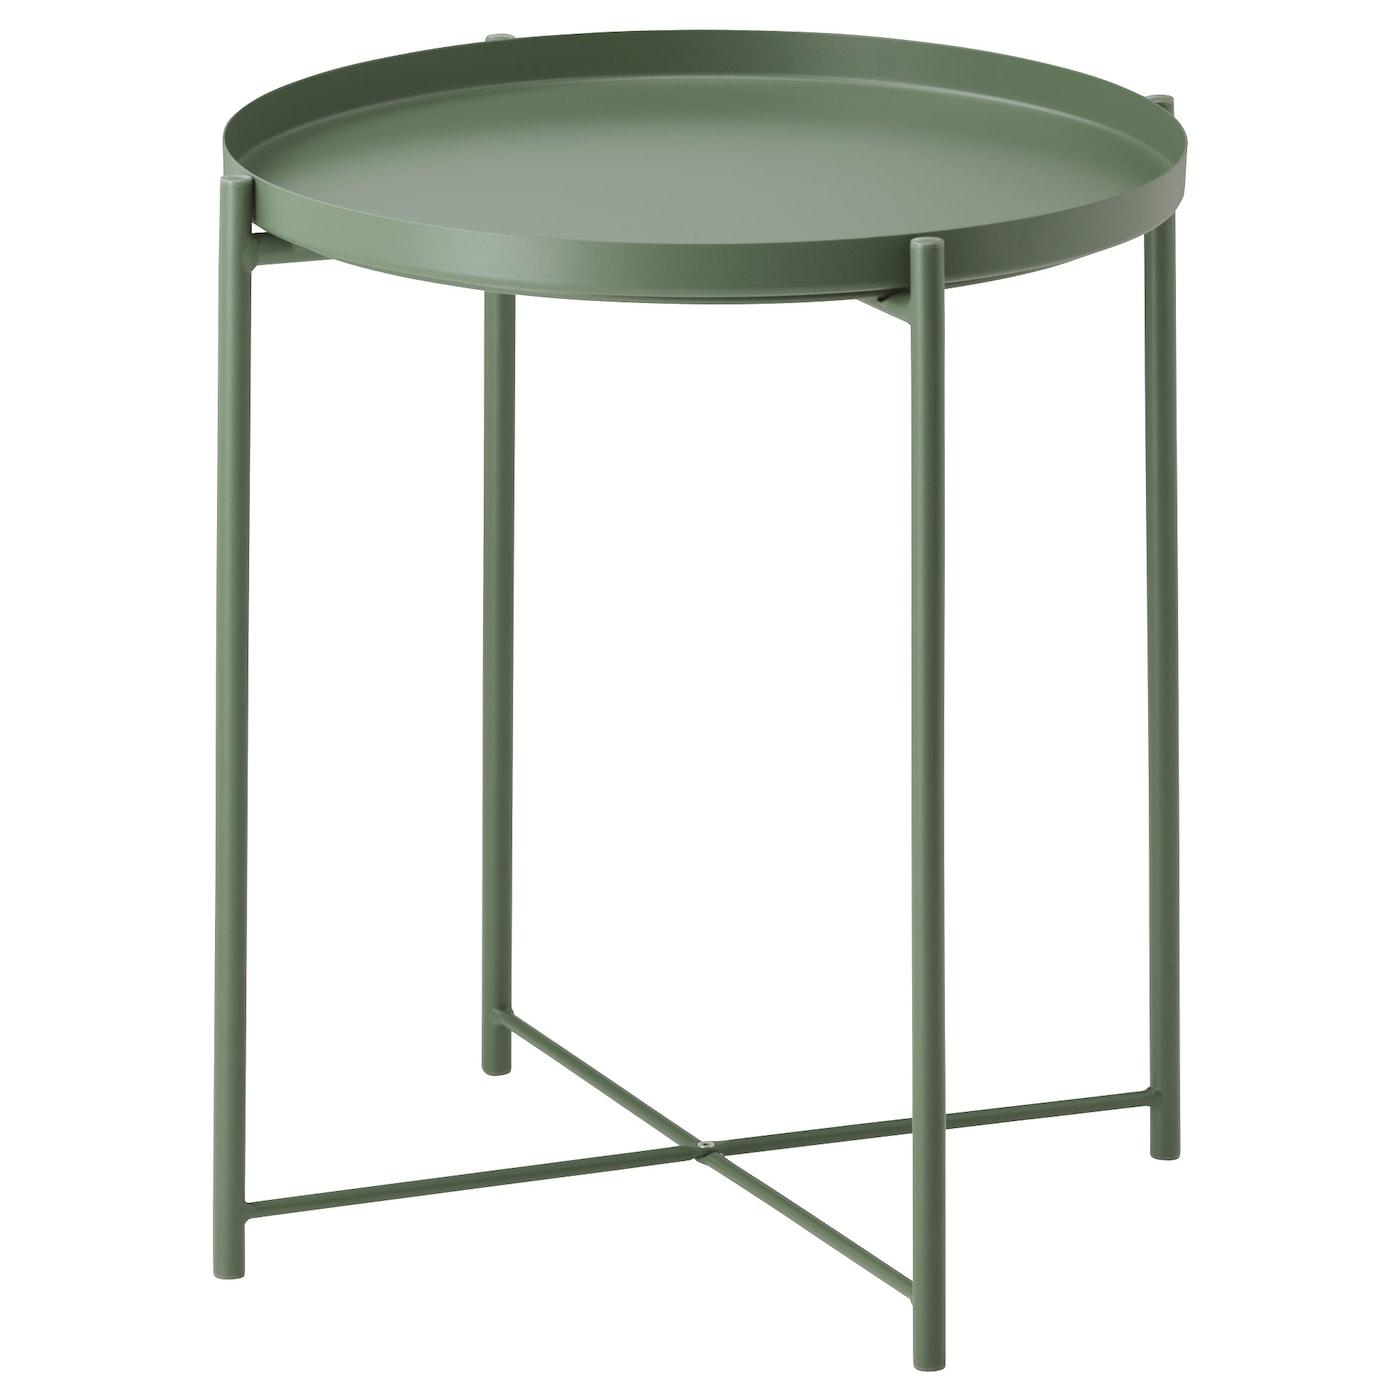 Gladom table plateau vert fonc 45x53 cm ikea - Ikea plateau de table ...